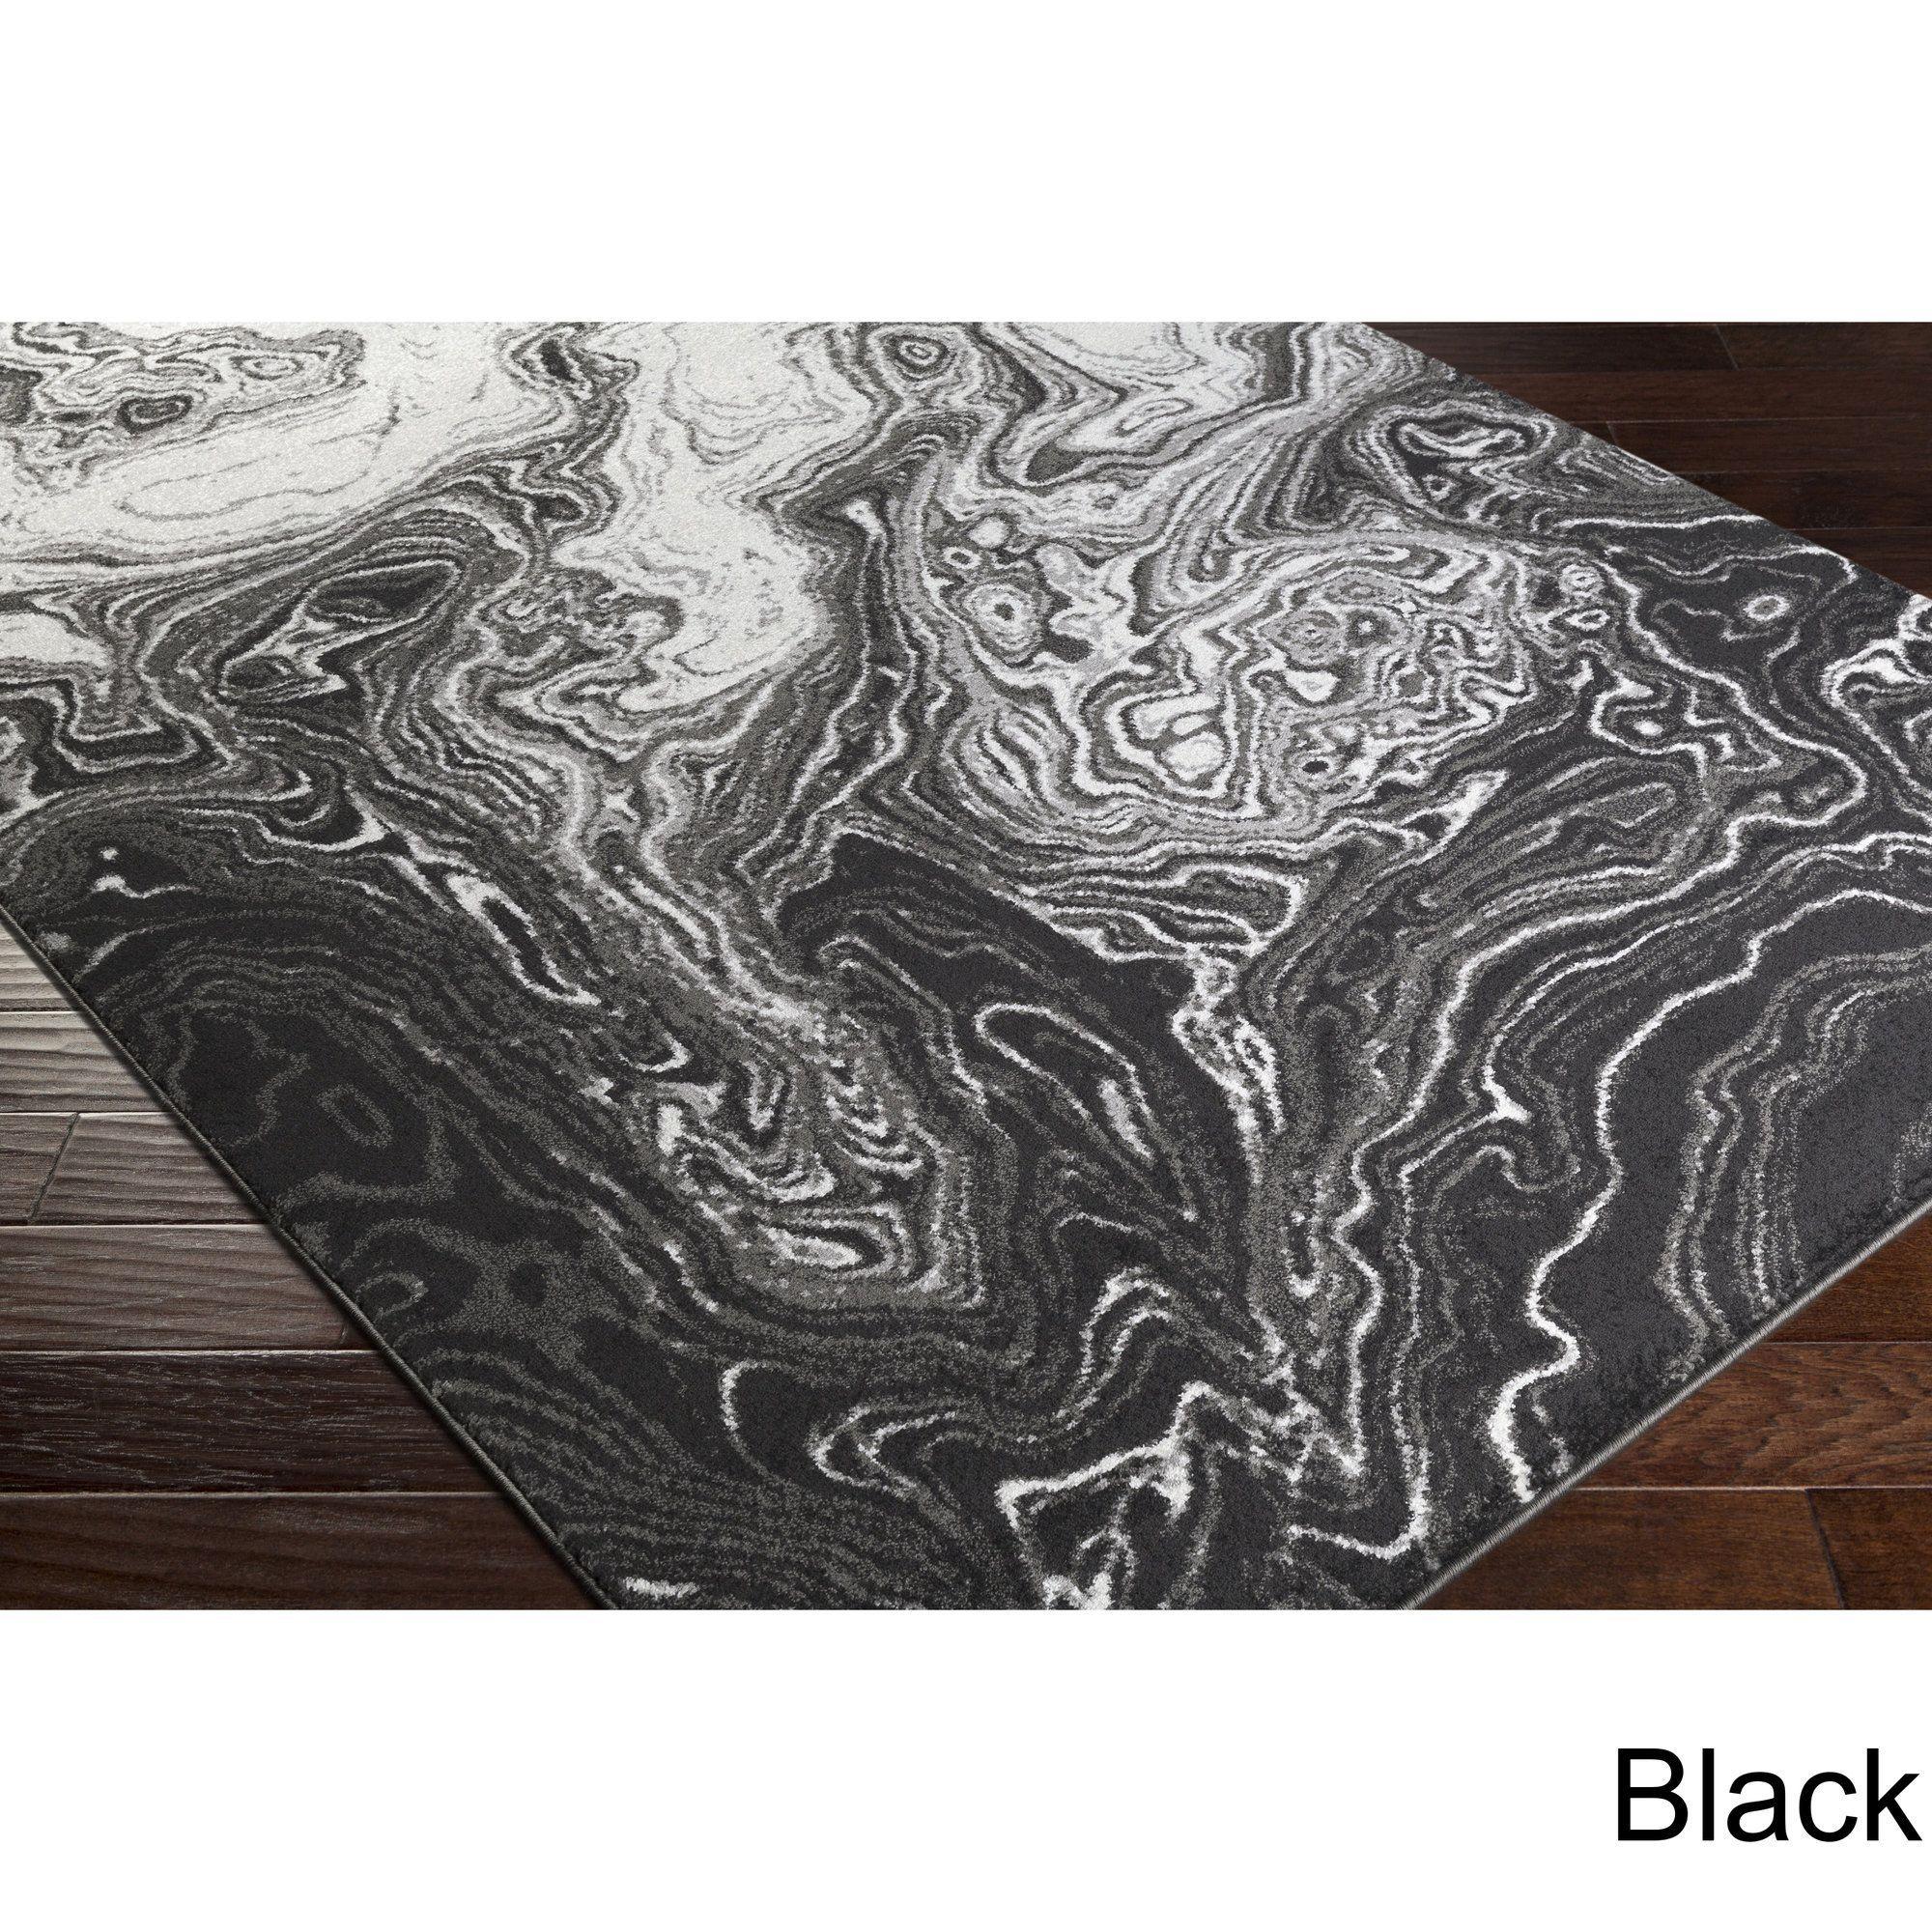 Madeline Mystic Black & Grey Rug 5 3 x 7 6 Black Size 5 x 8 Polypropylene Abstract